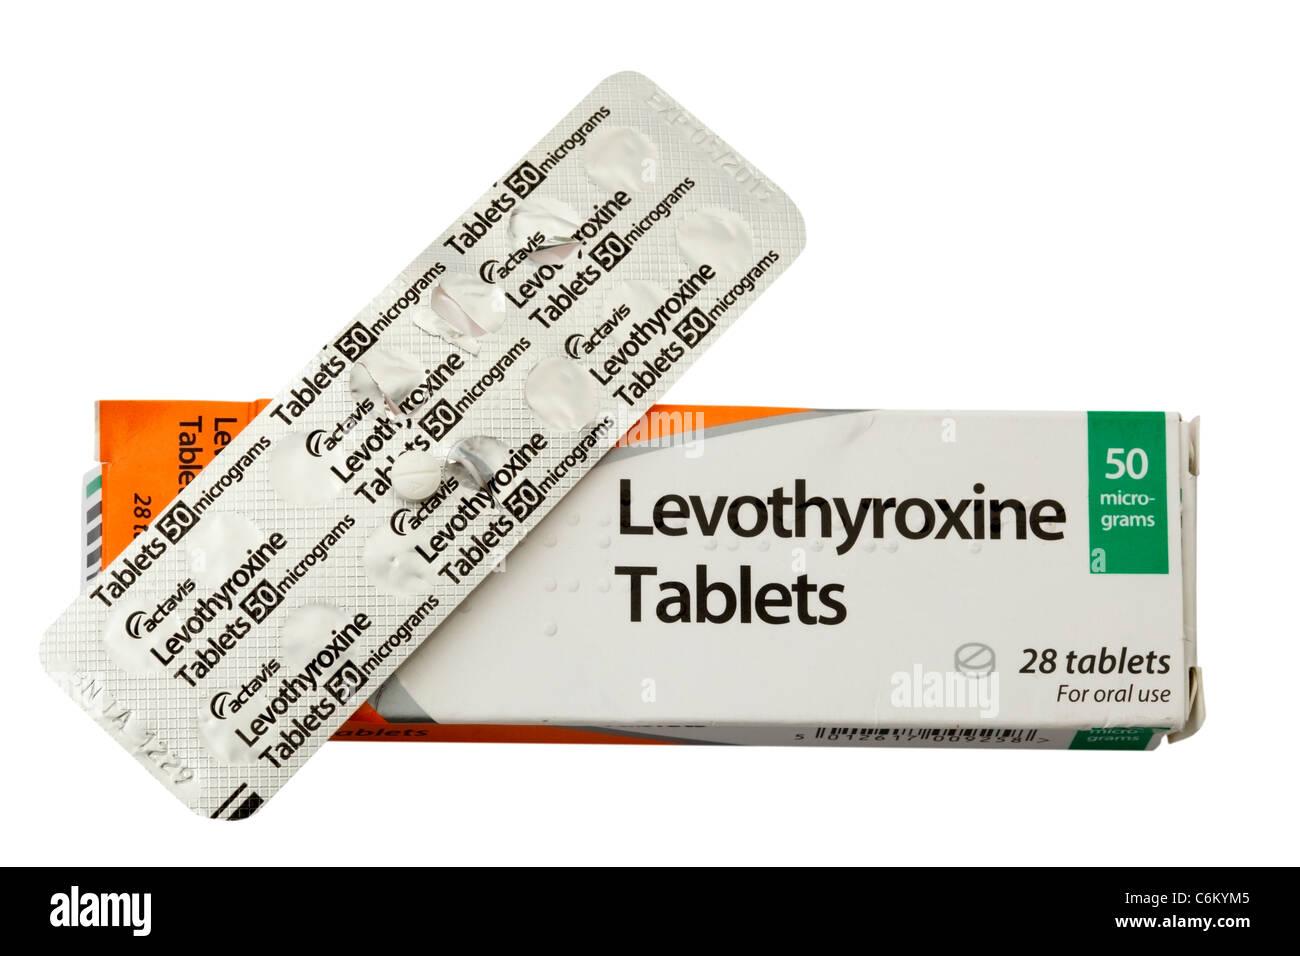 Levothyroxine photo